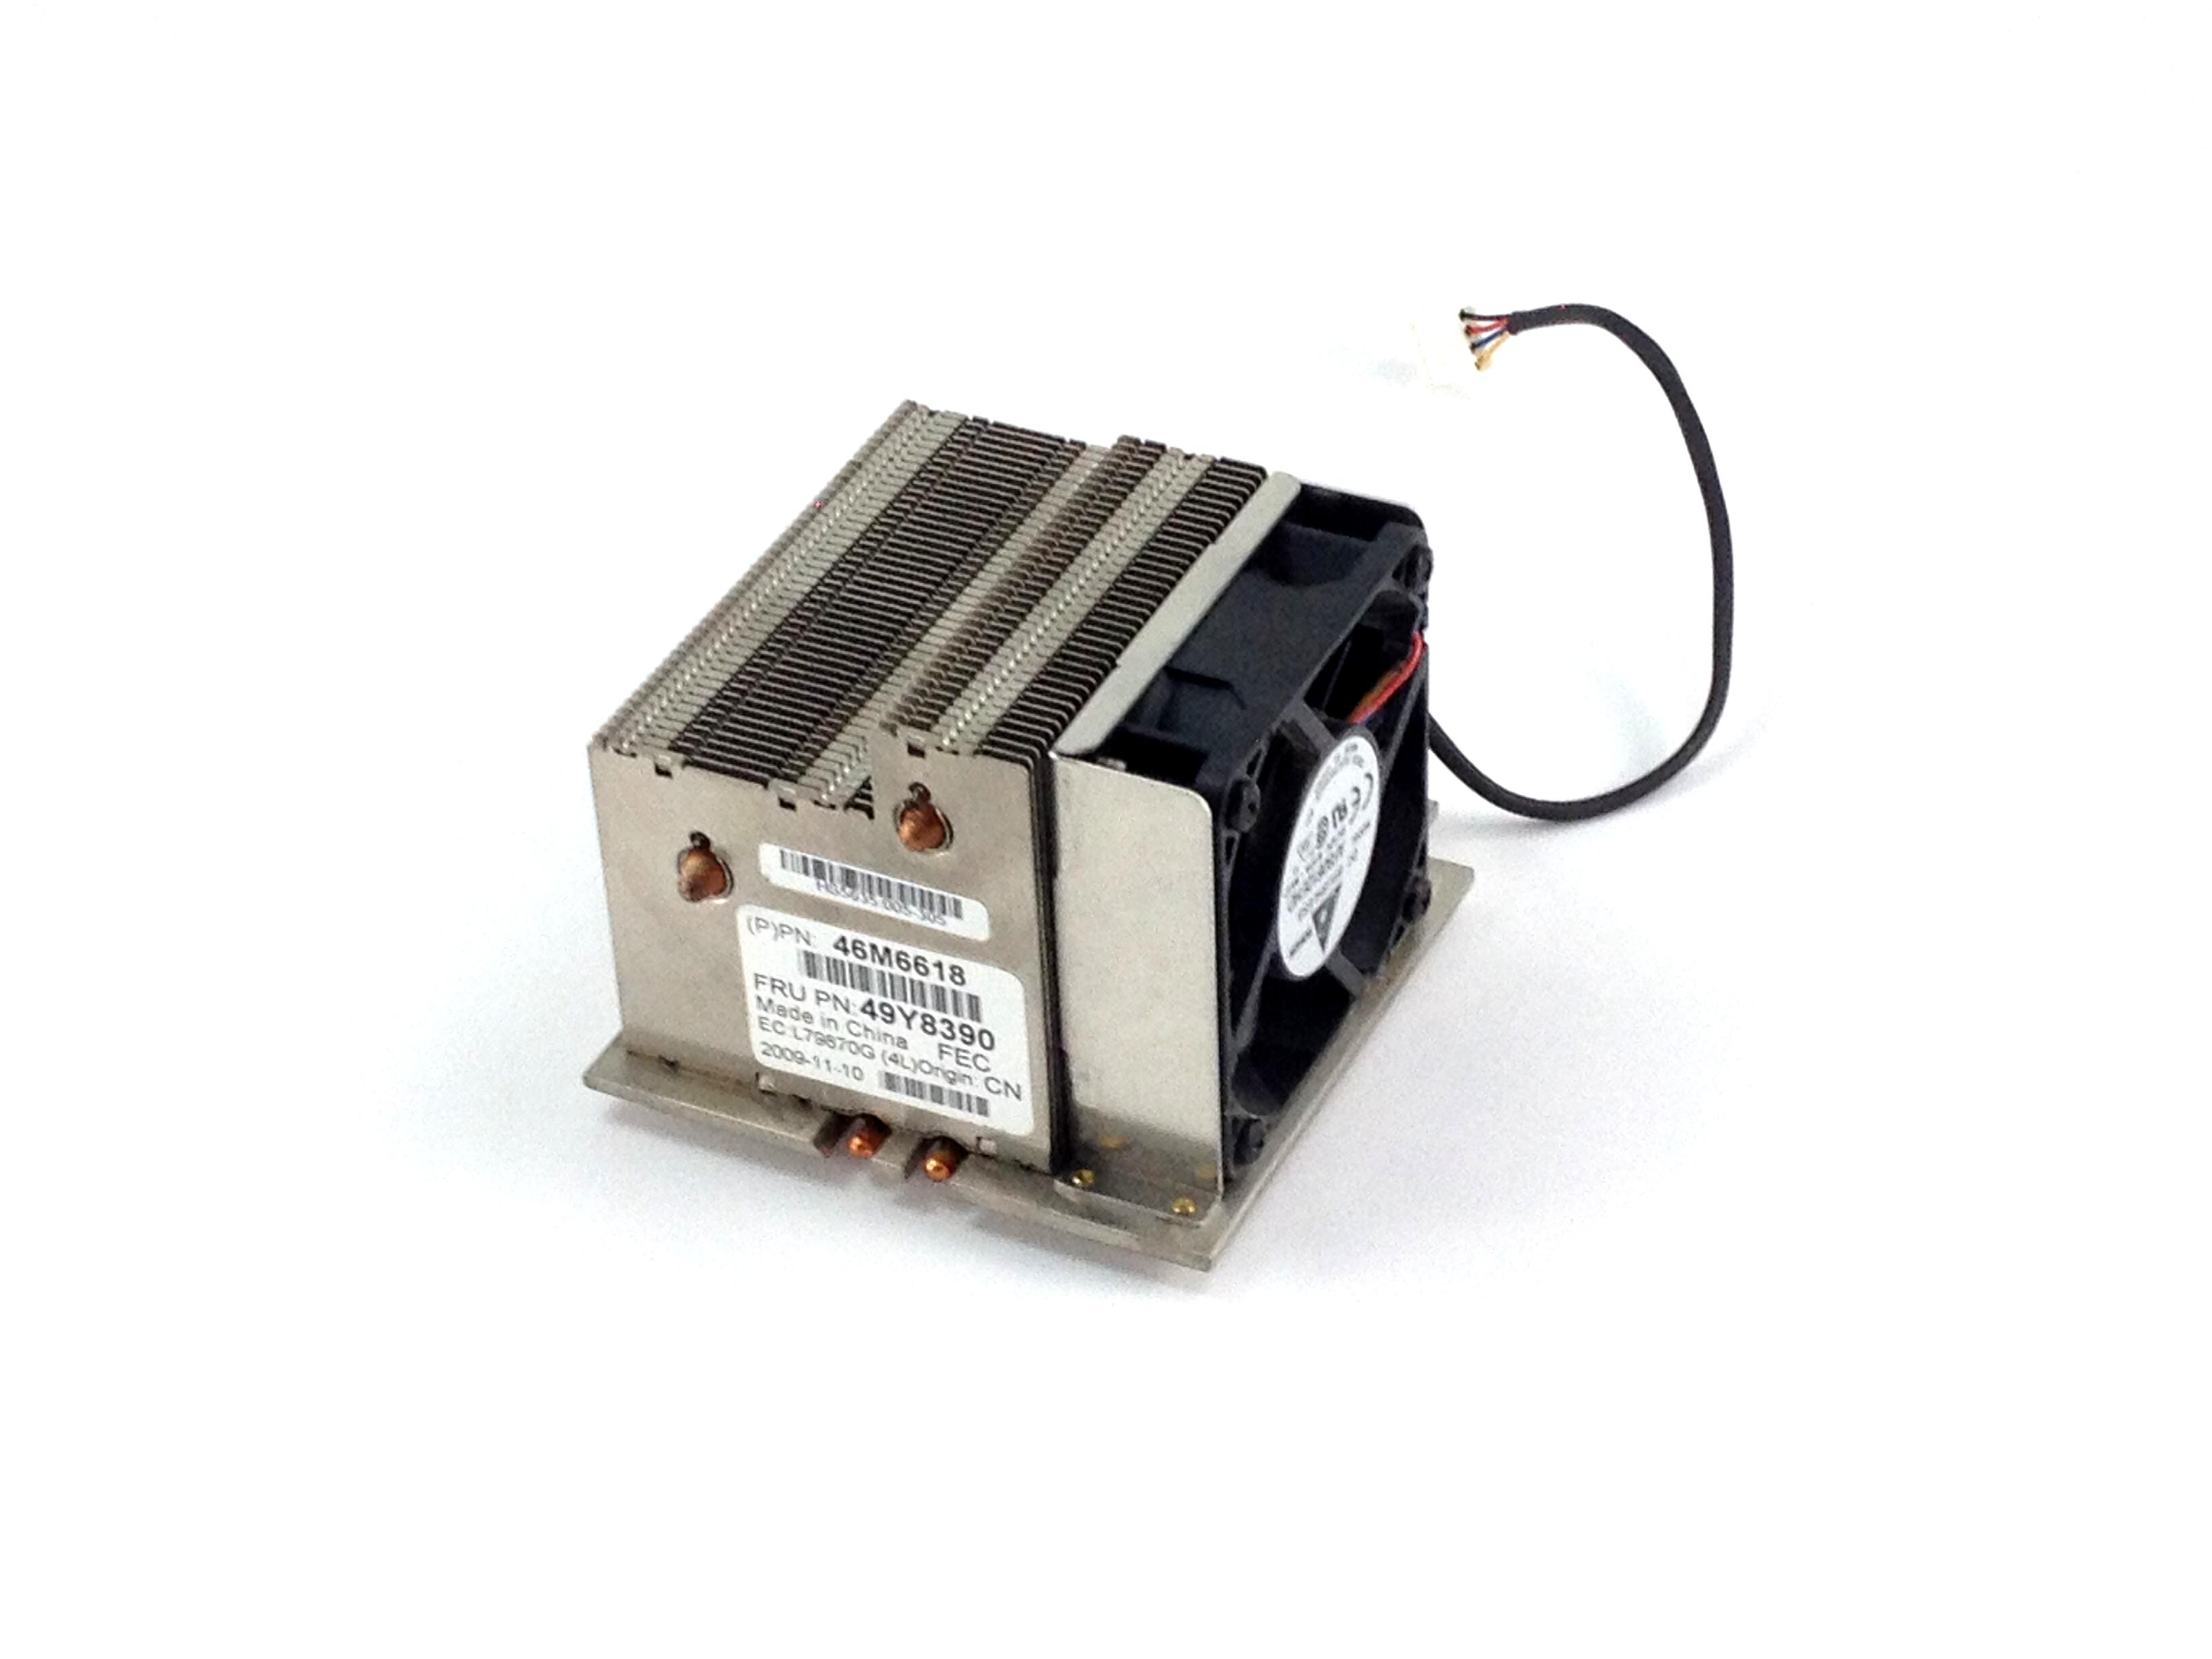 SNK-P0047P Supermicro 1U 2011-0 Socket Processor Heatsink